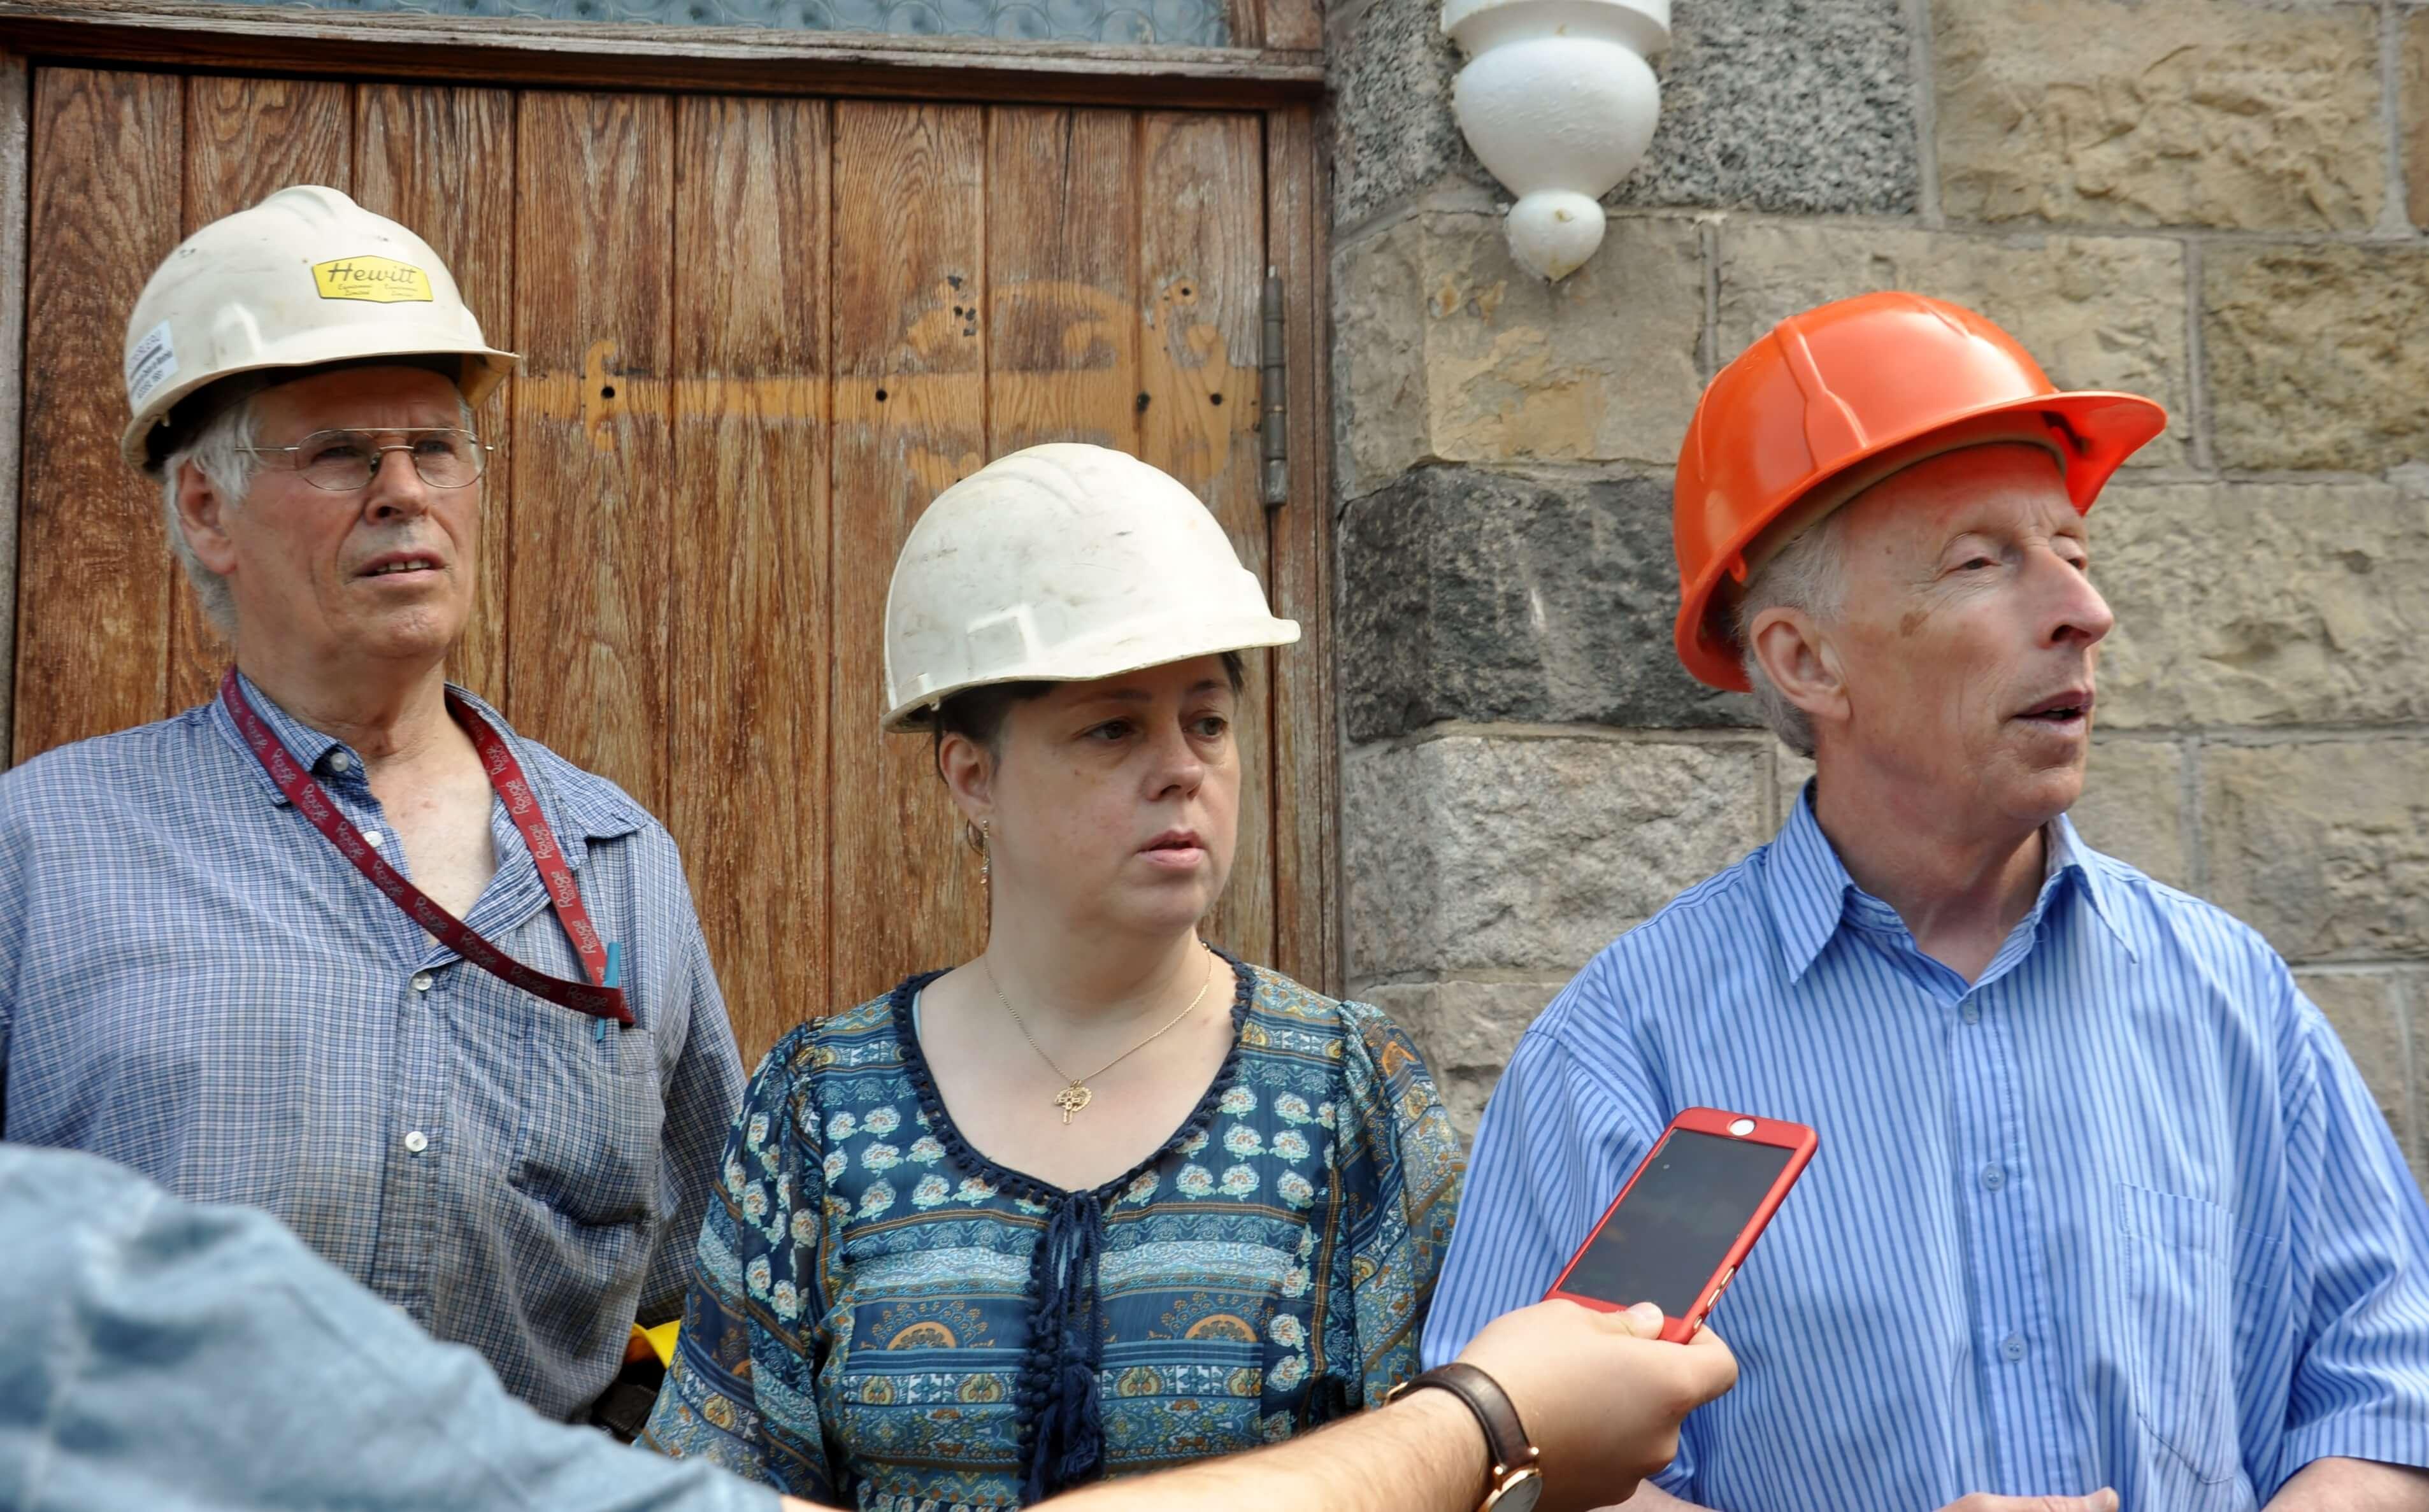 Albert Carré, Nathalie Leblond, Jean-Charles-Lechasseur